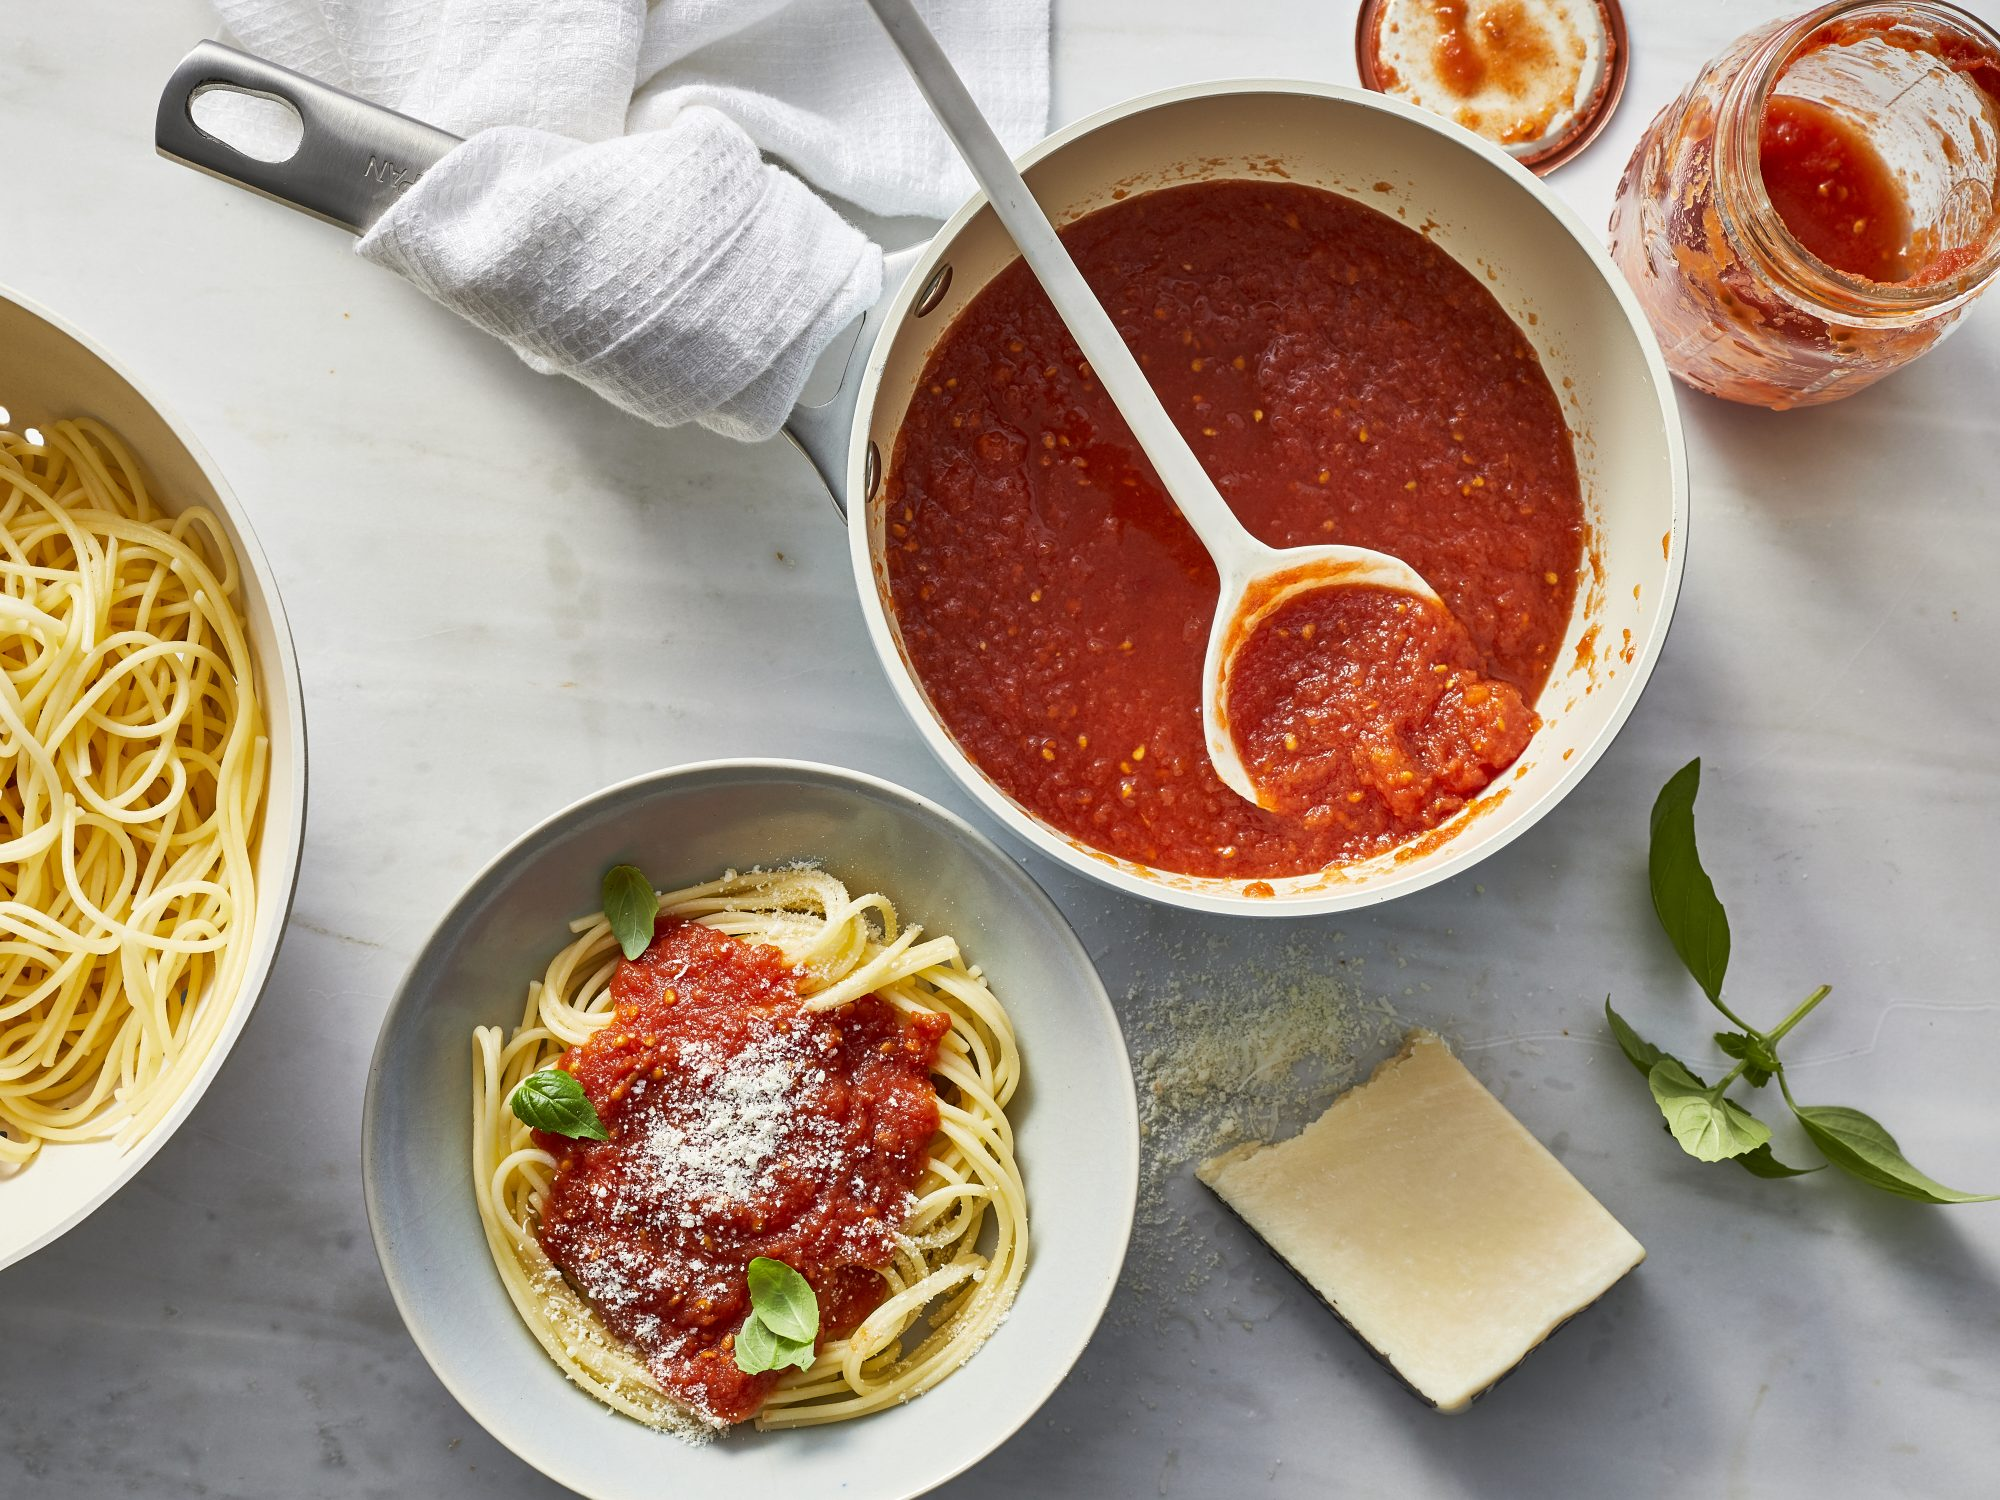 mr-Fresh Tomato Sauce image